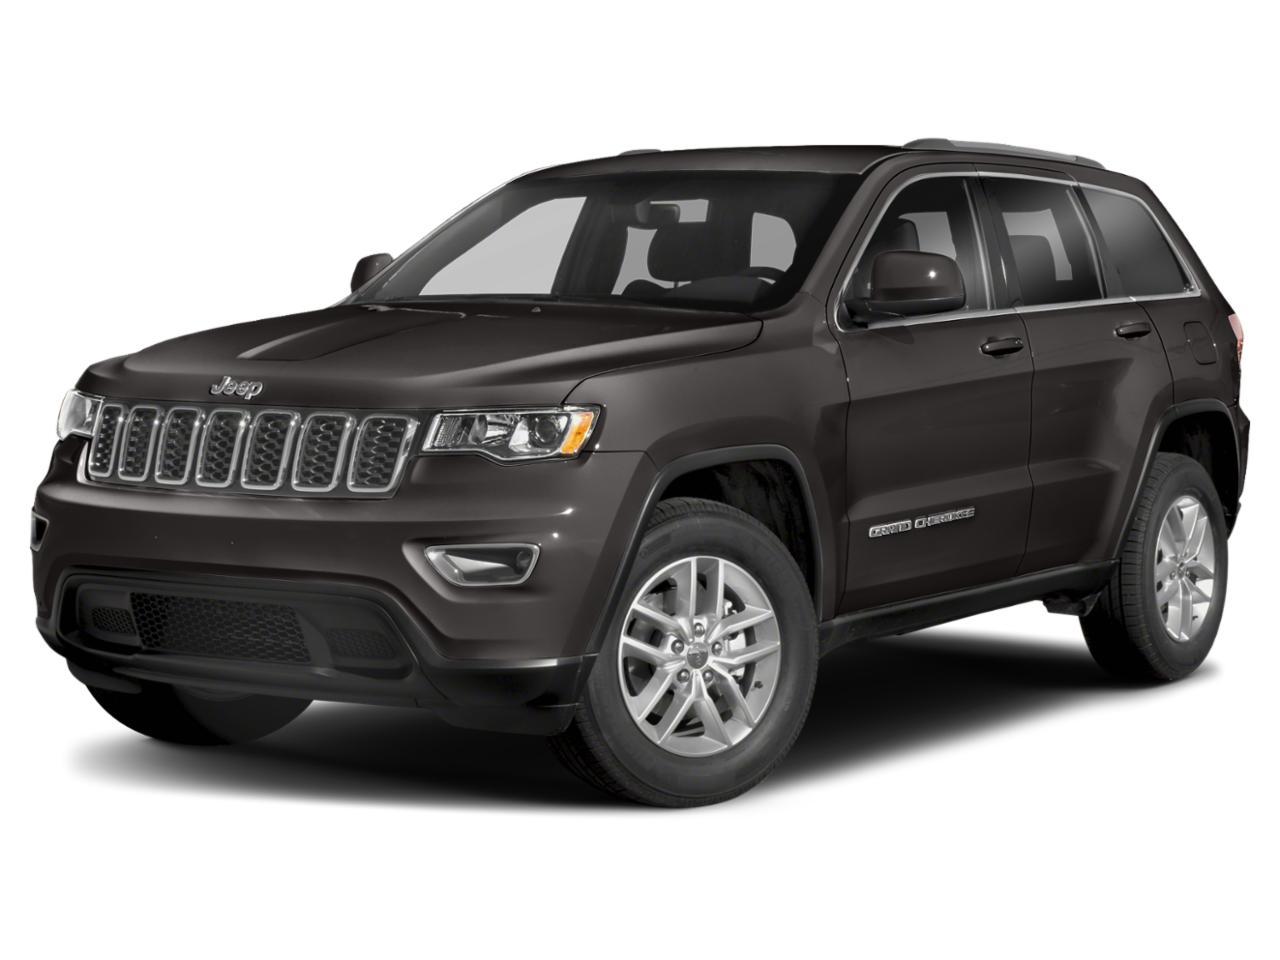 2019 Jeep Grand Cherokee Vehicle Photo in Midland, TX 79703